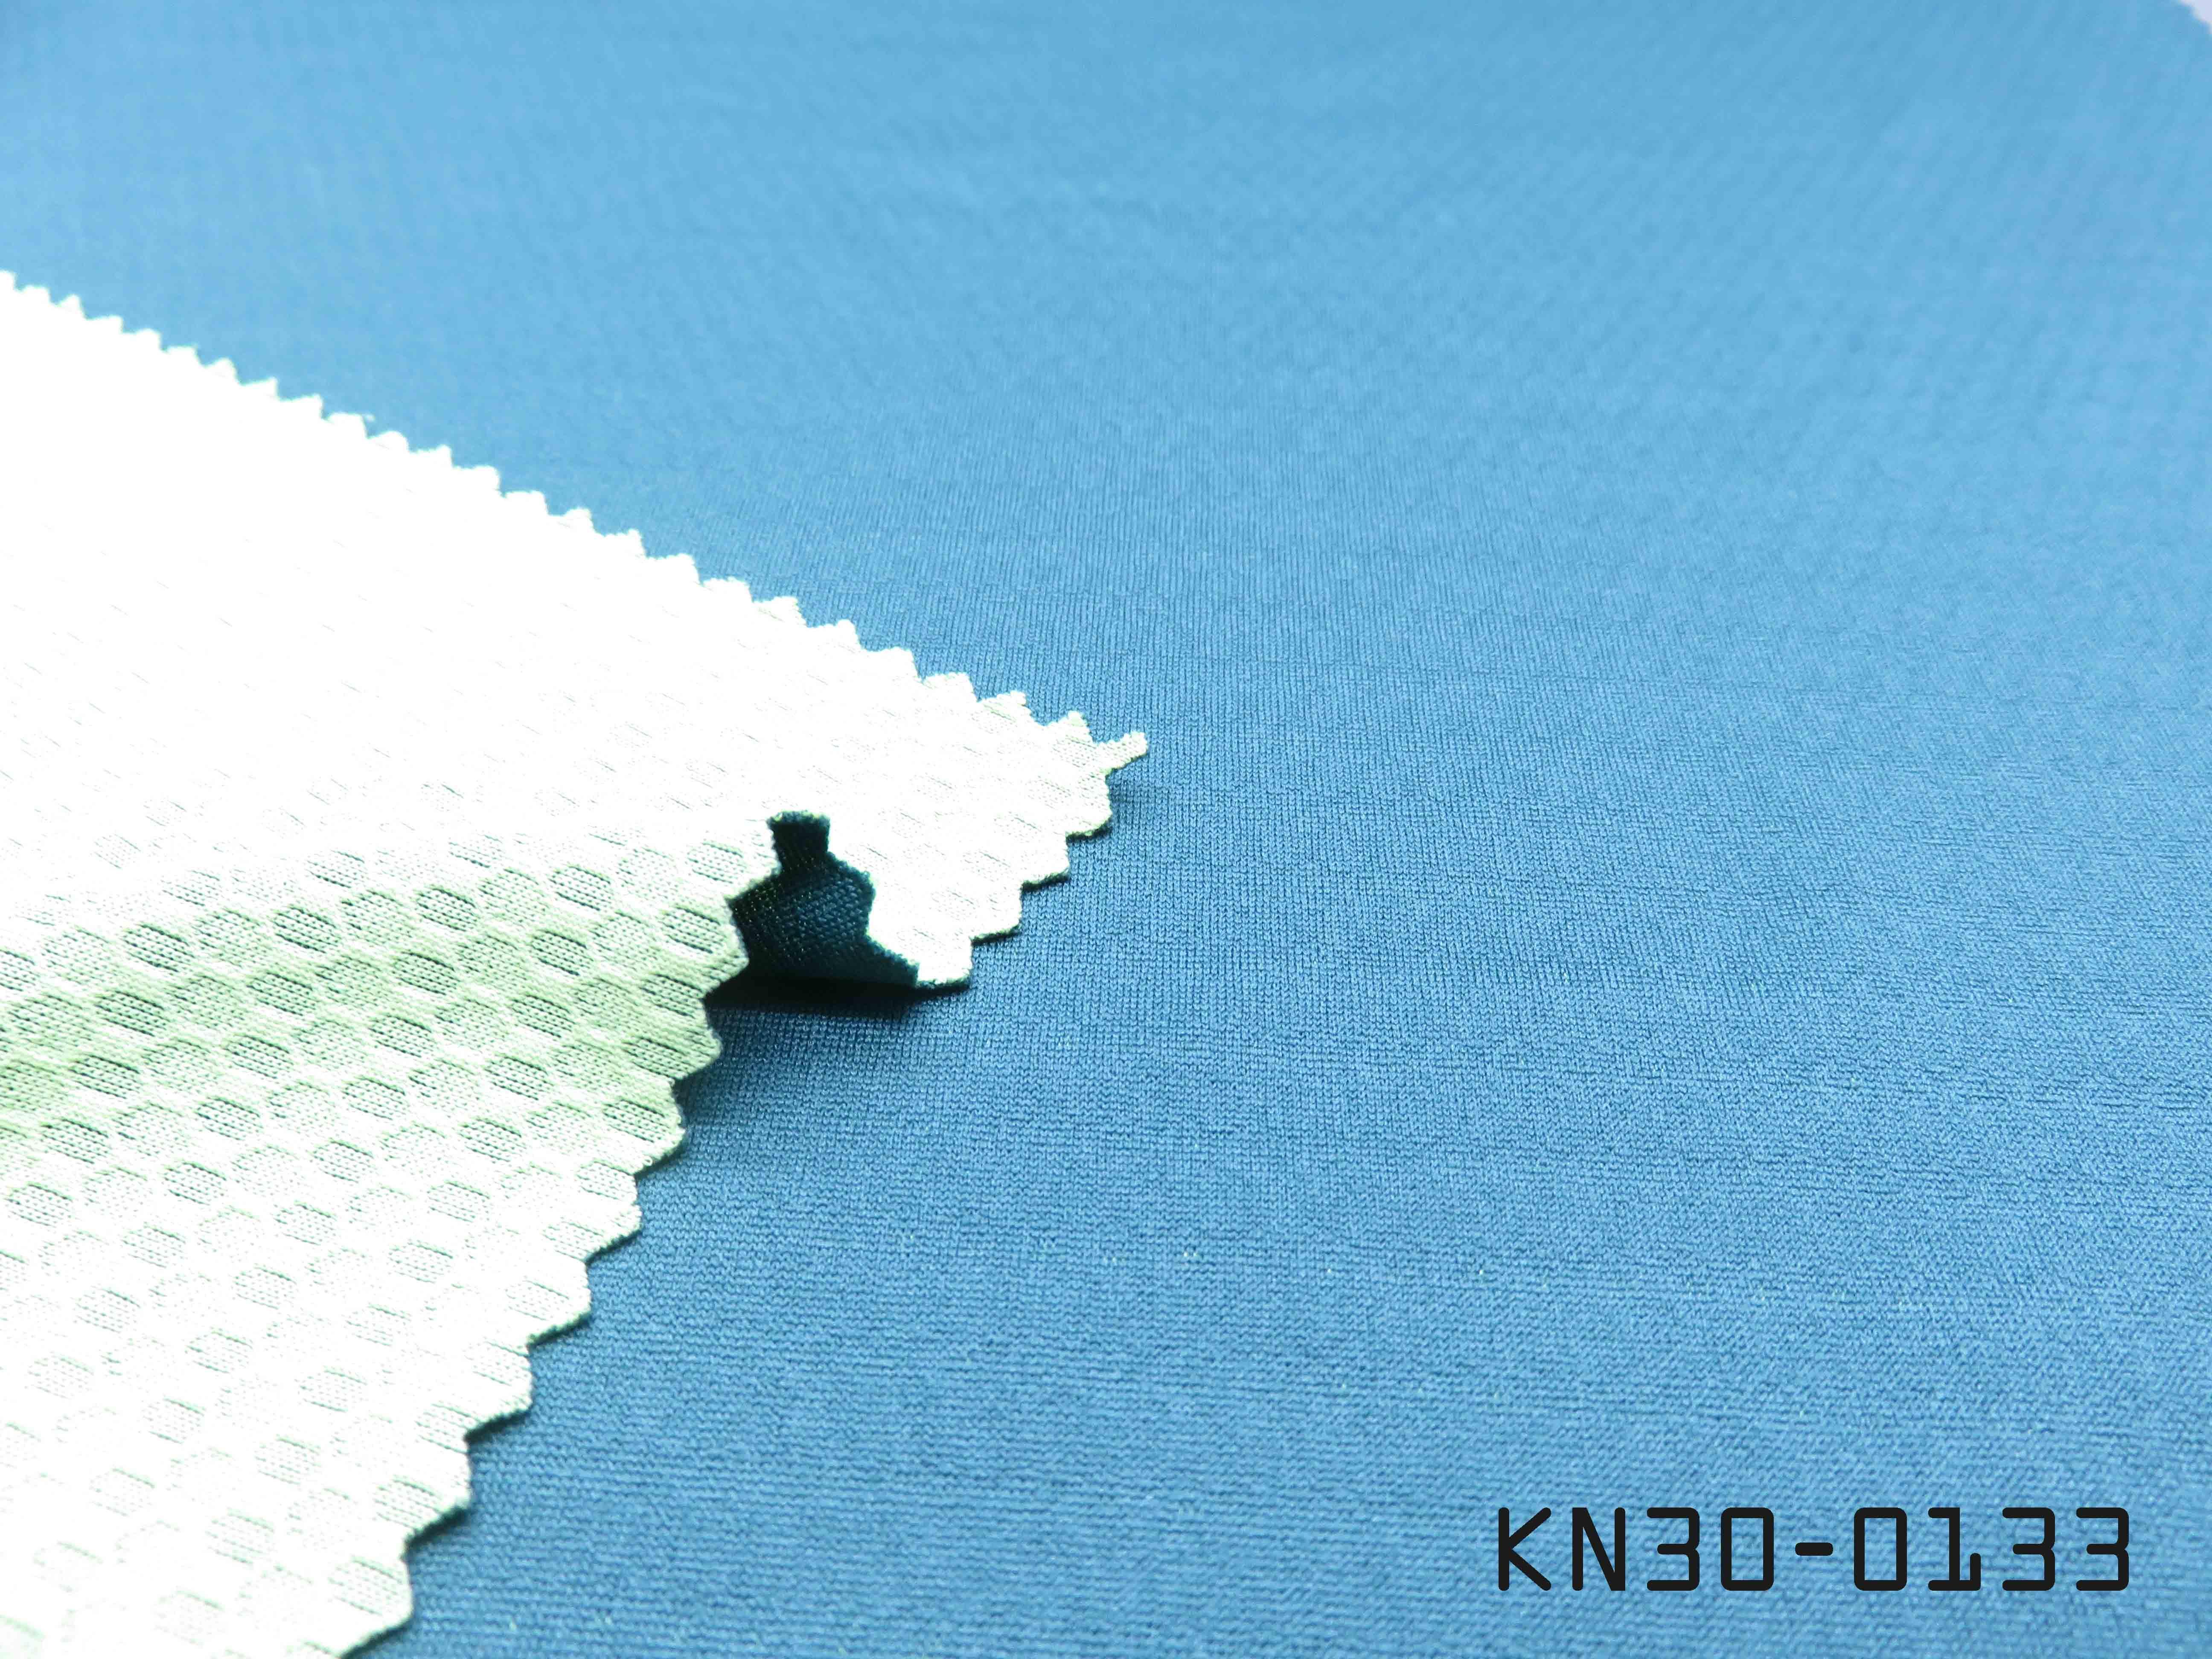 KN30-0133